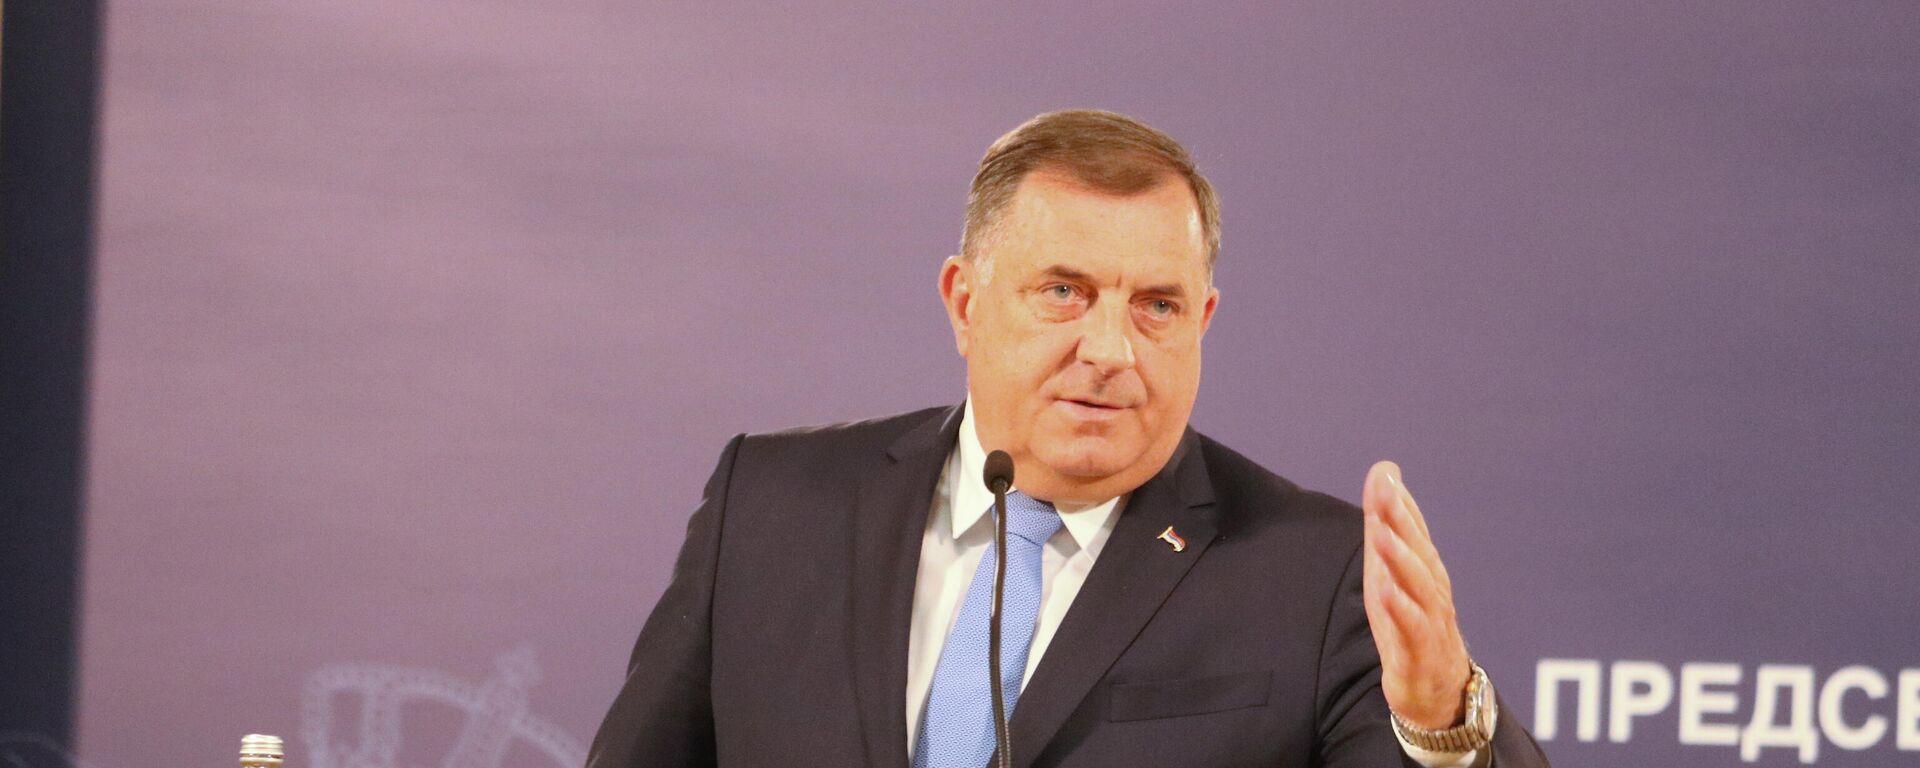 Milorad Dodik - Sputnik Srbija, 1920, 31.07.2021